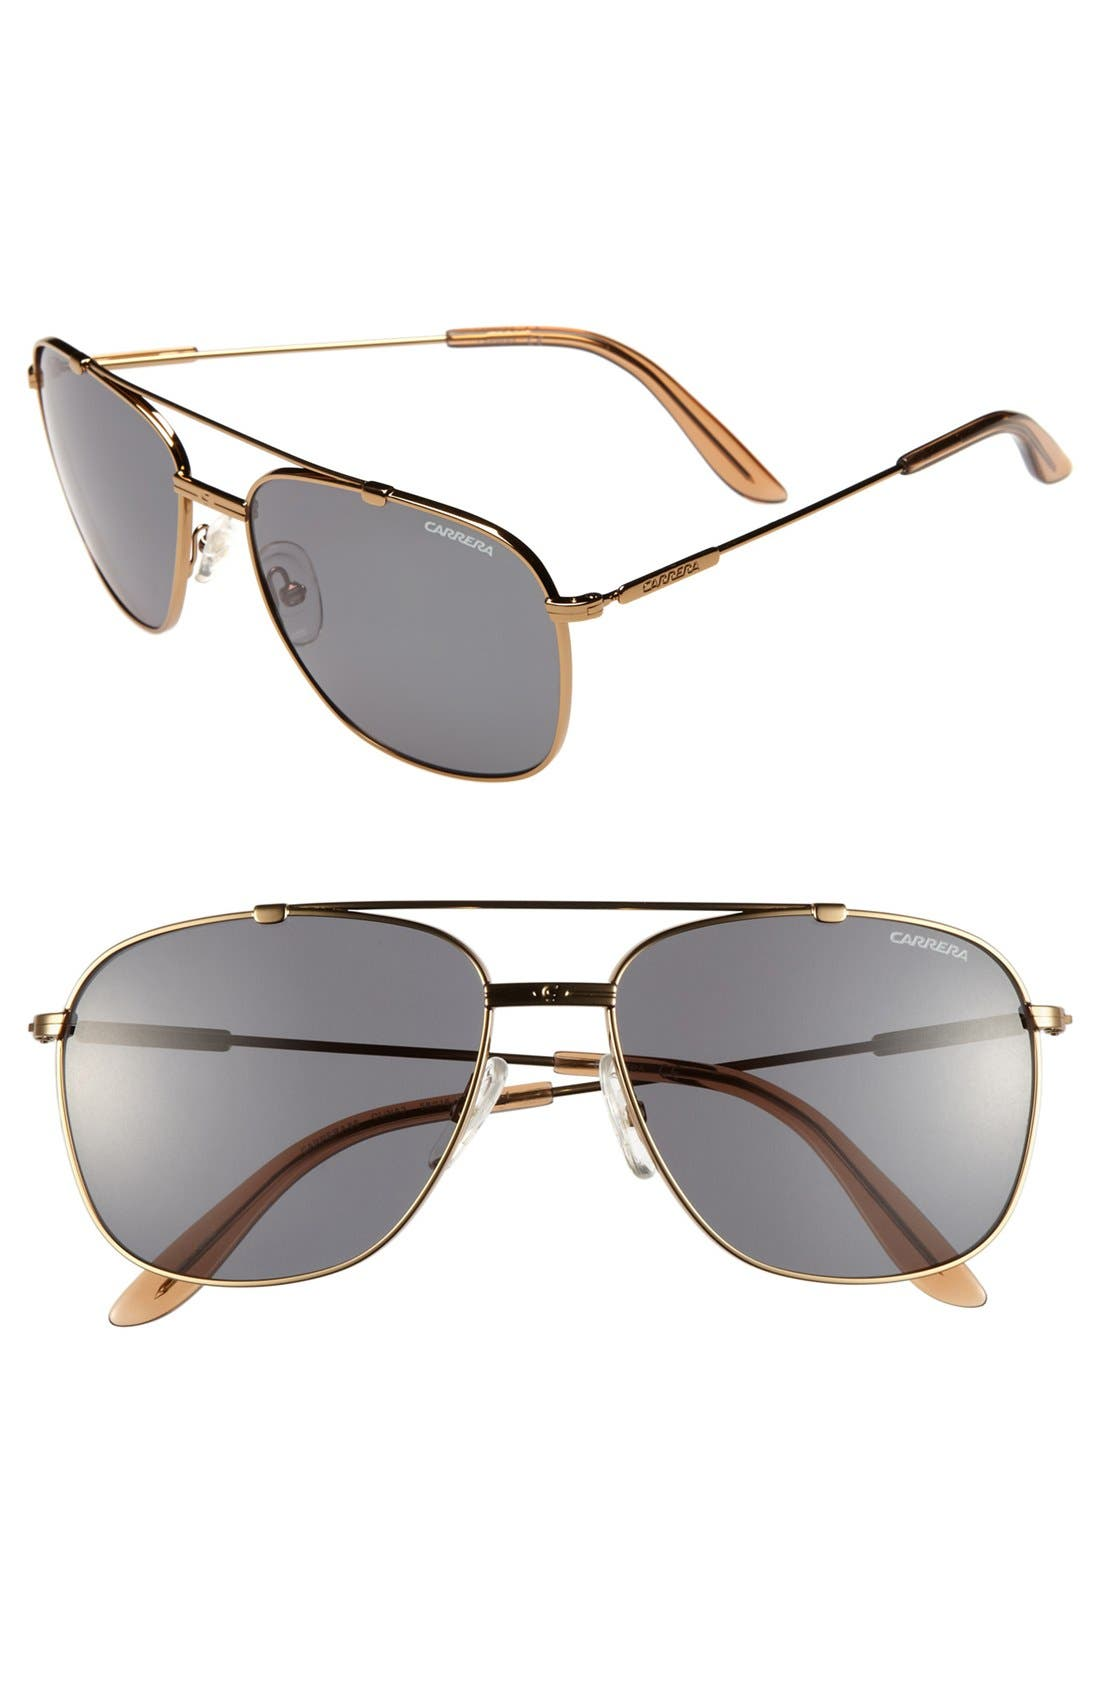 Alternate Image 1 Selected - Carrera Eyewear 58mm Sunglasses